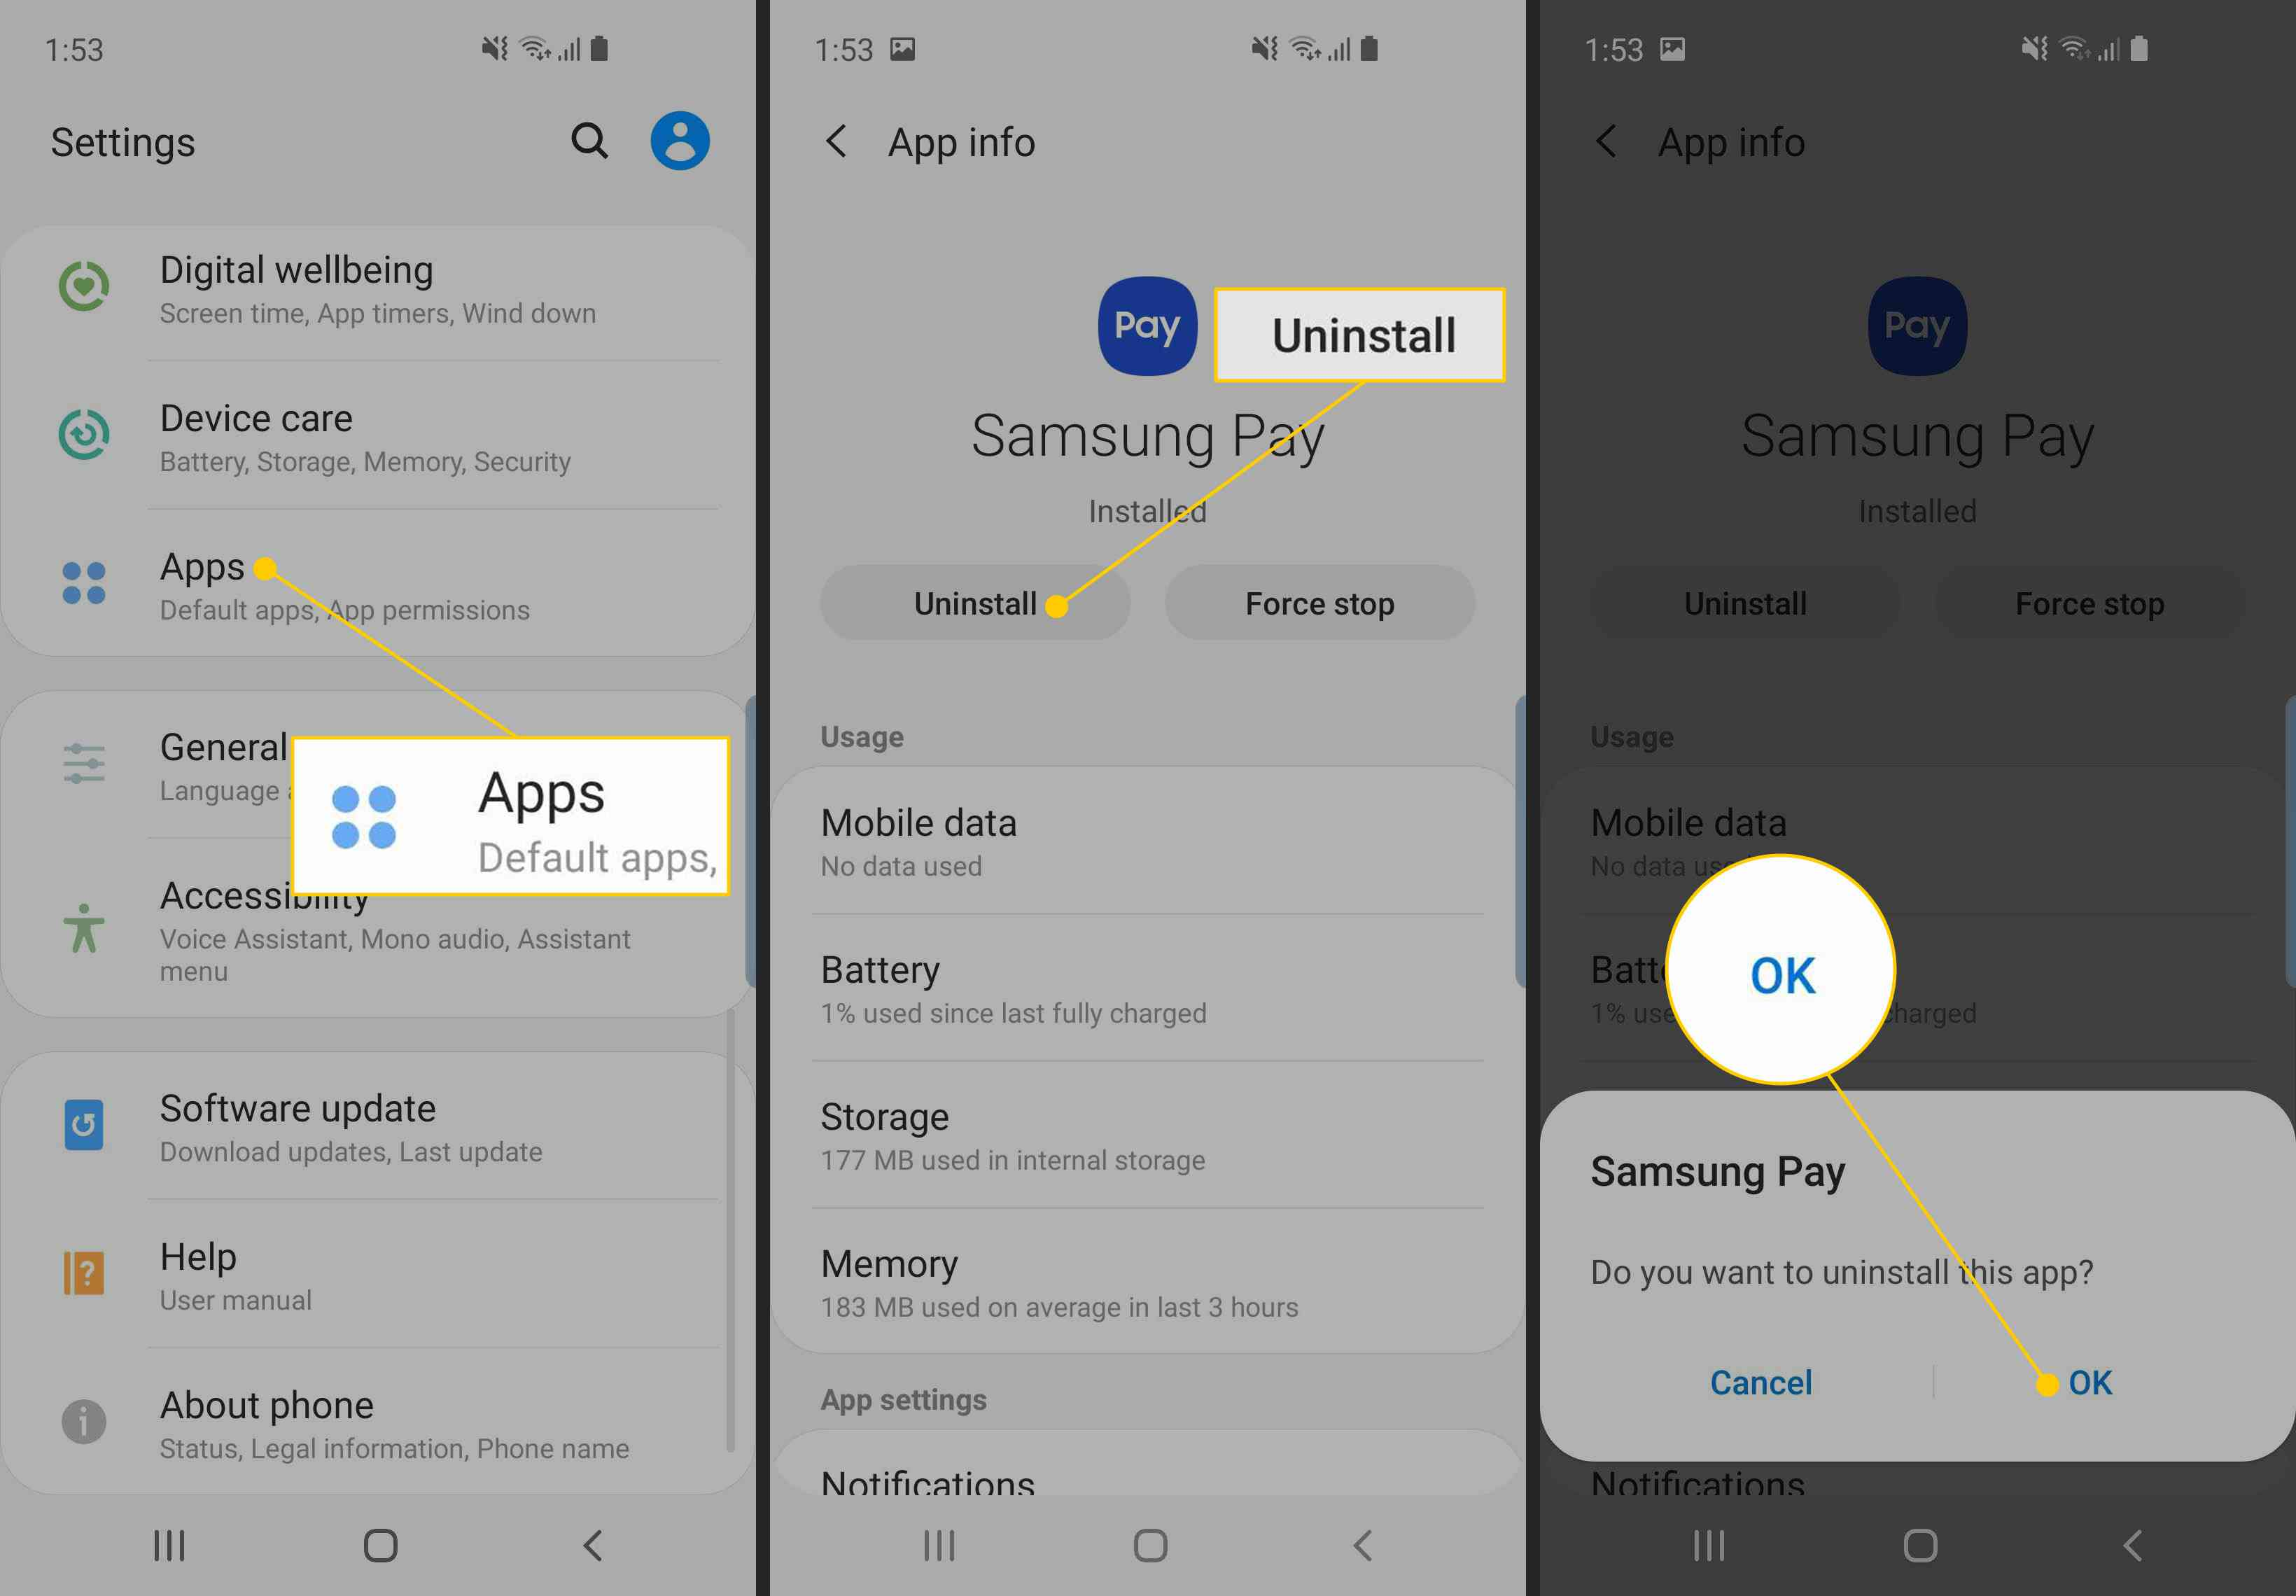 Apps, Uninstall button, OK button on Samsung